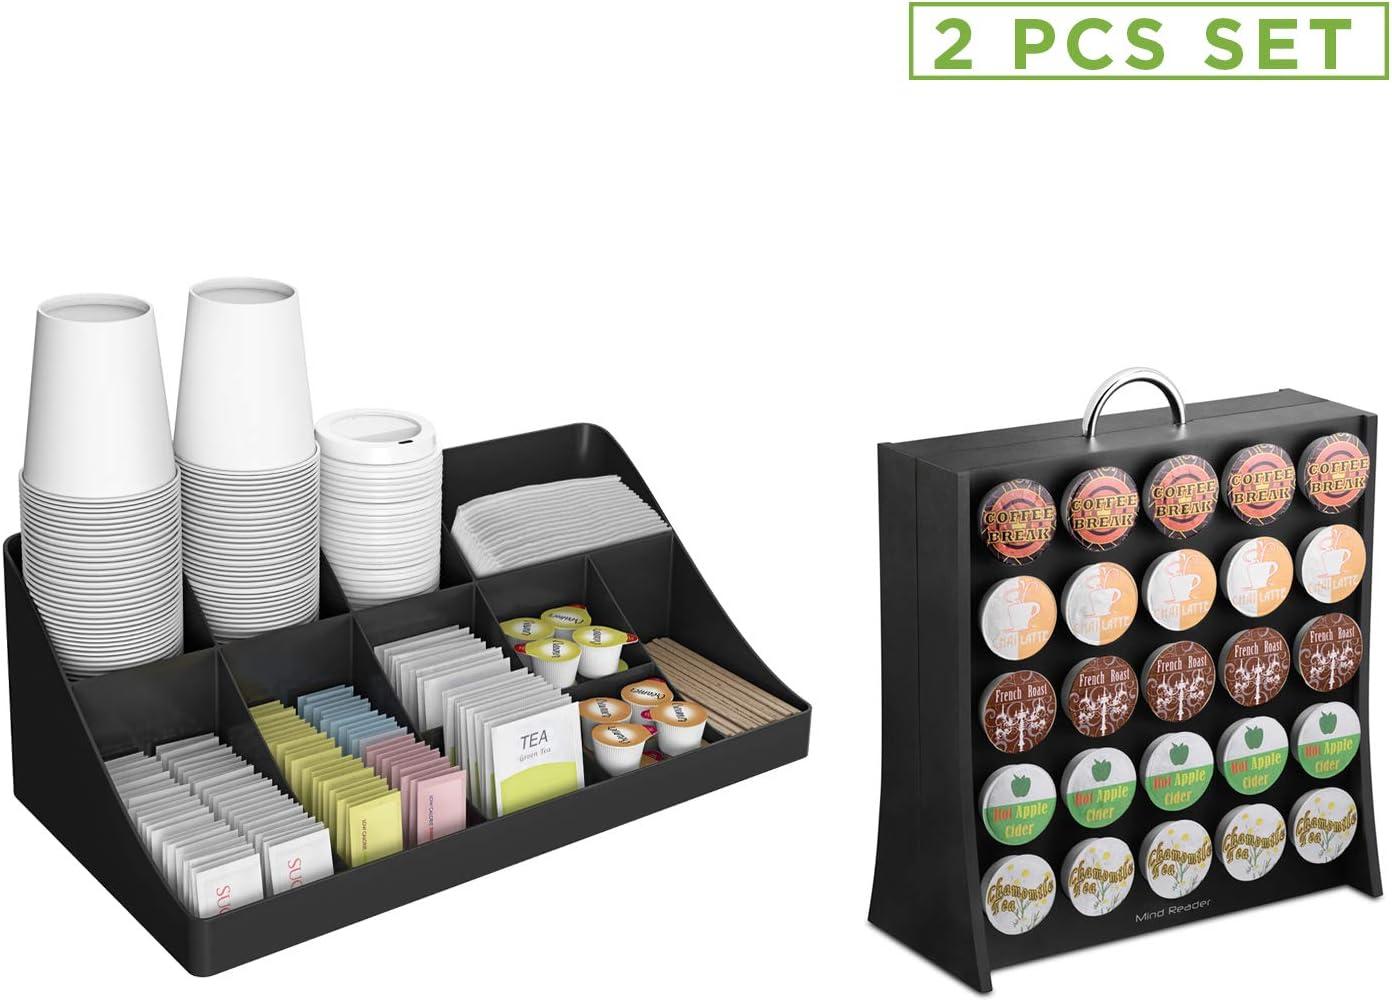 Paper Cup Holder Dispenser Organizer Rack Stand Cafe Breakroom Storage Q